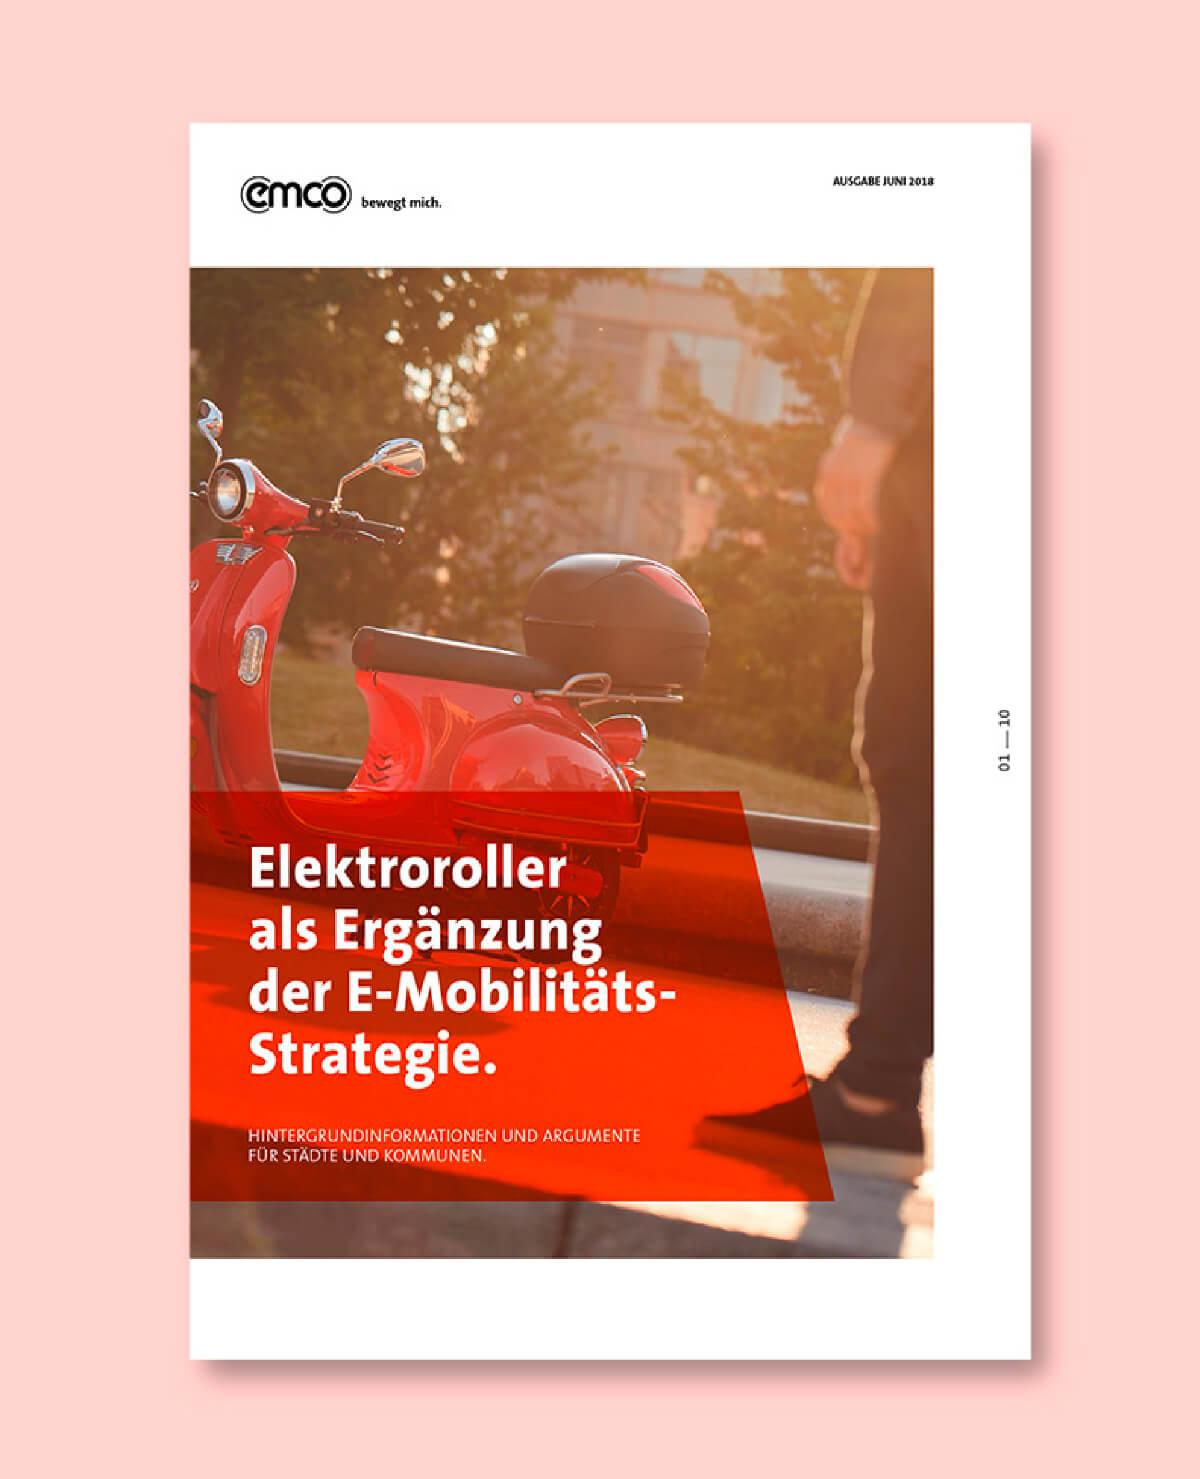 cyclos emco elektroroller broschüre stadt elektro marketing grün marketingkonzept